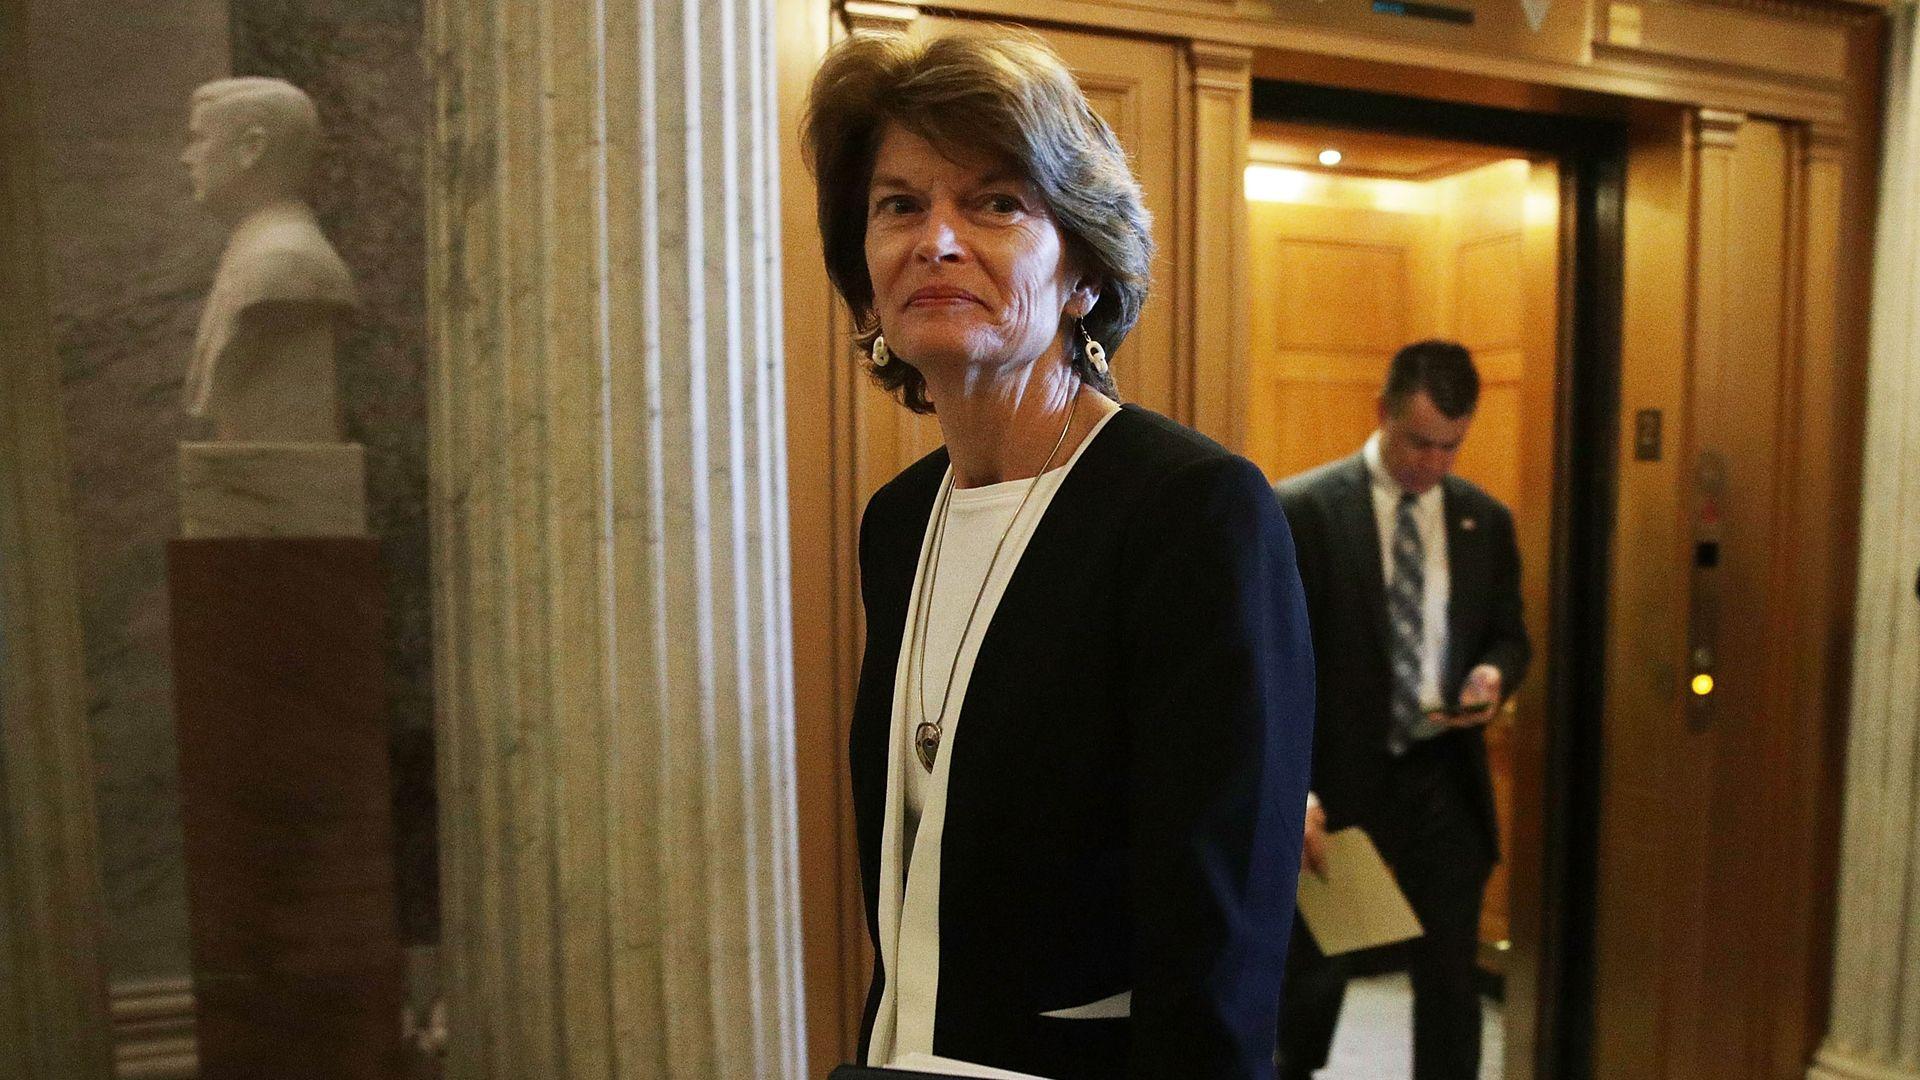 Sen. Lisa Murkowski walks into Capitol Building